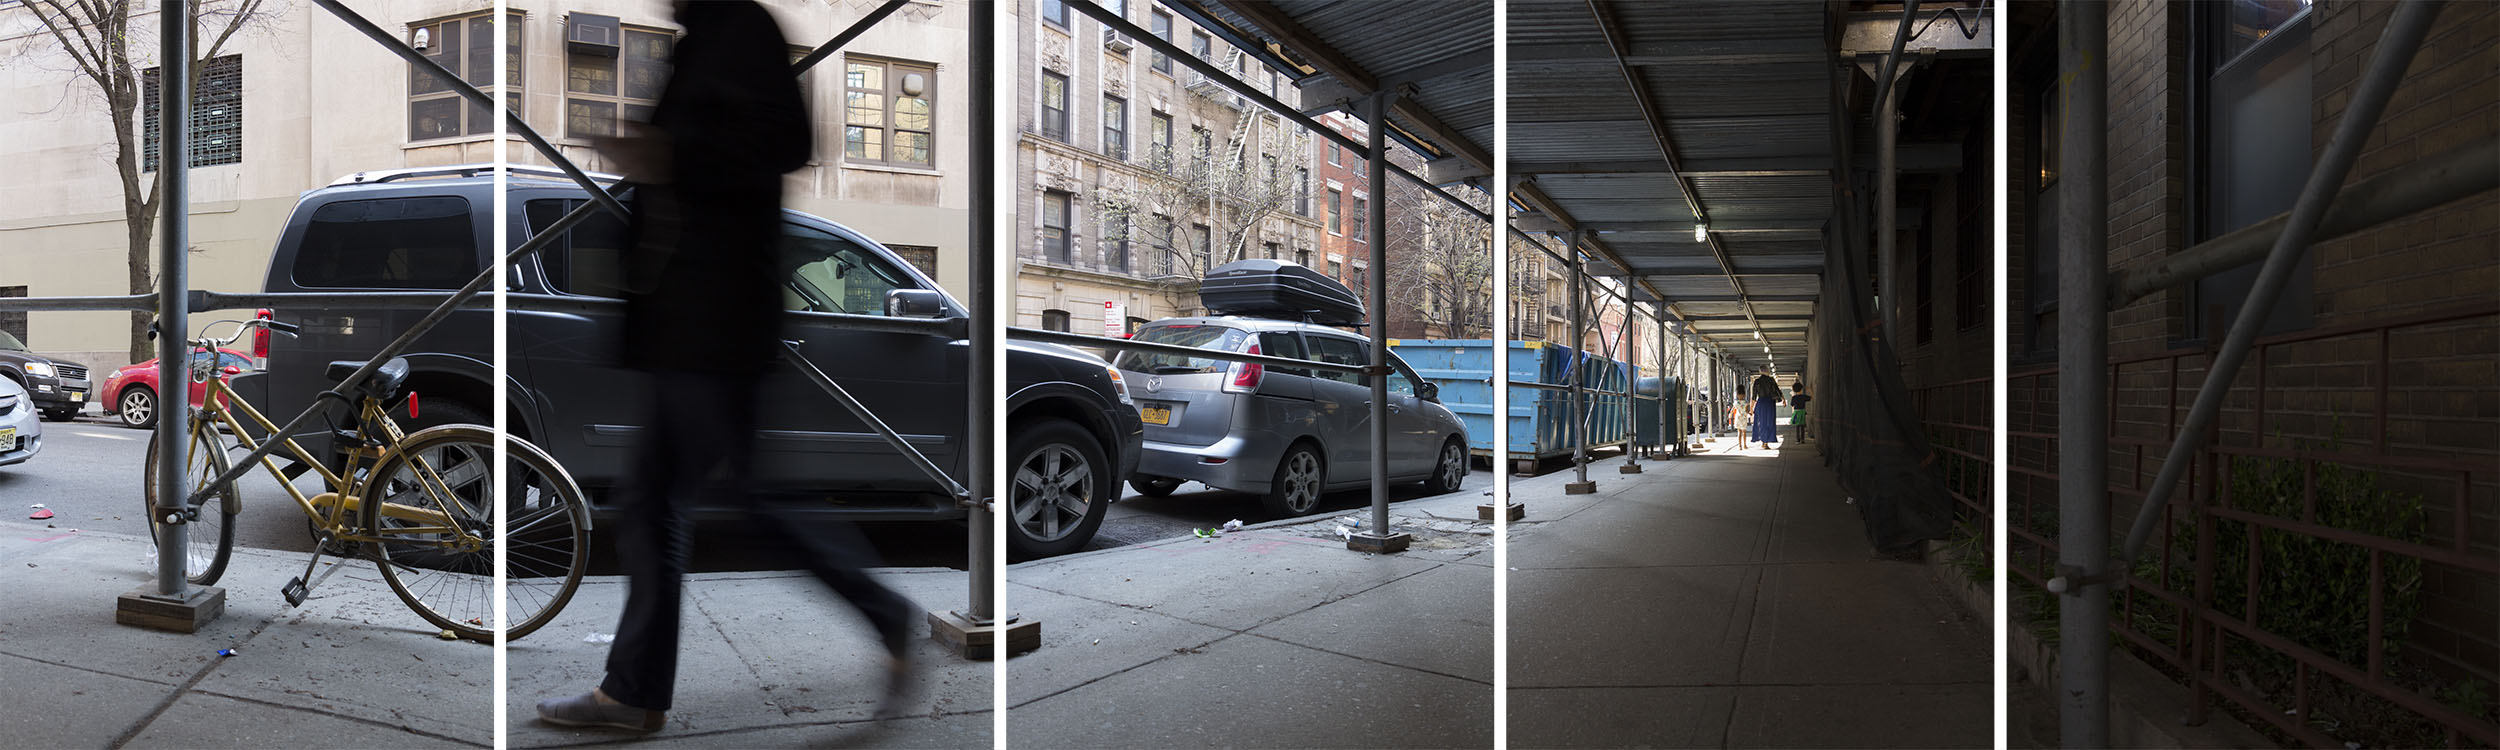 New York, Manhattan,4-18-2015,6469-6474